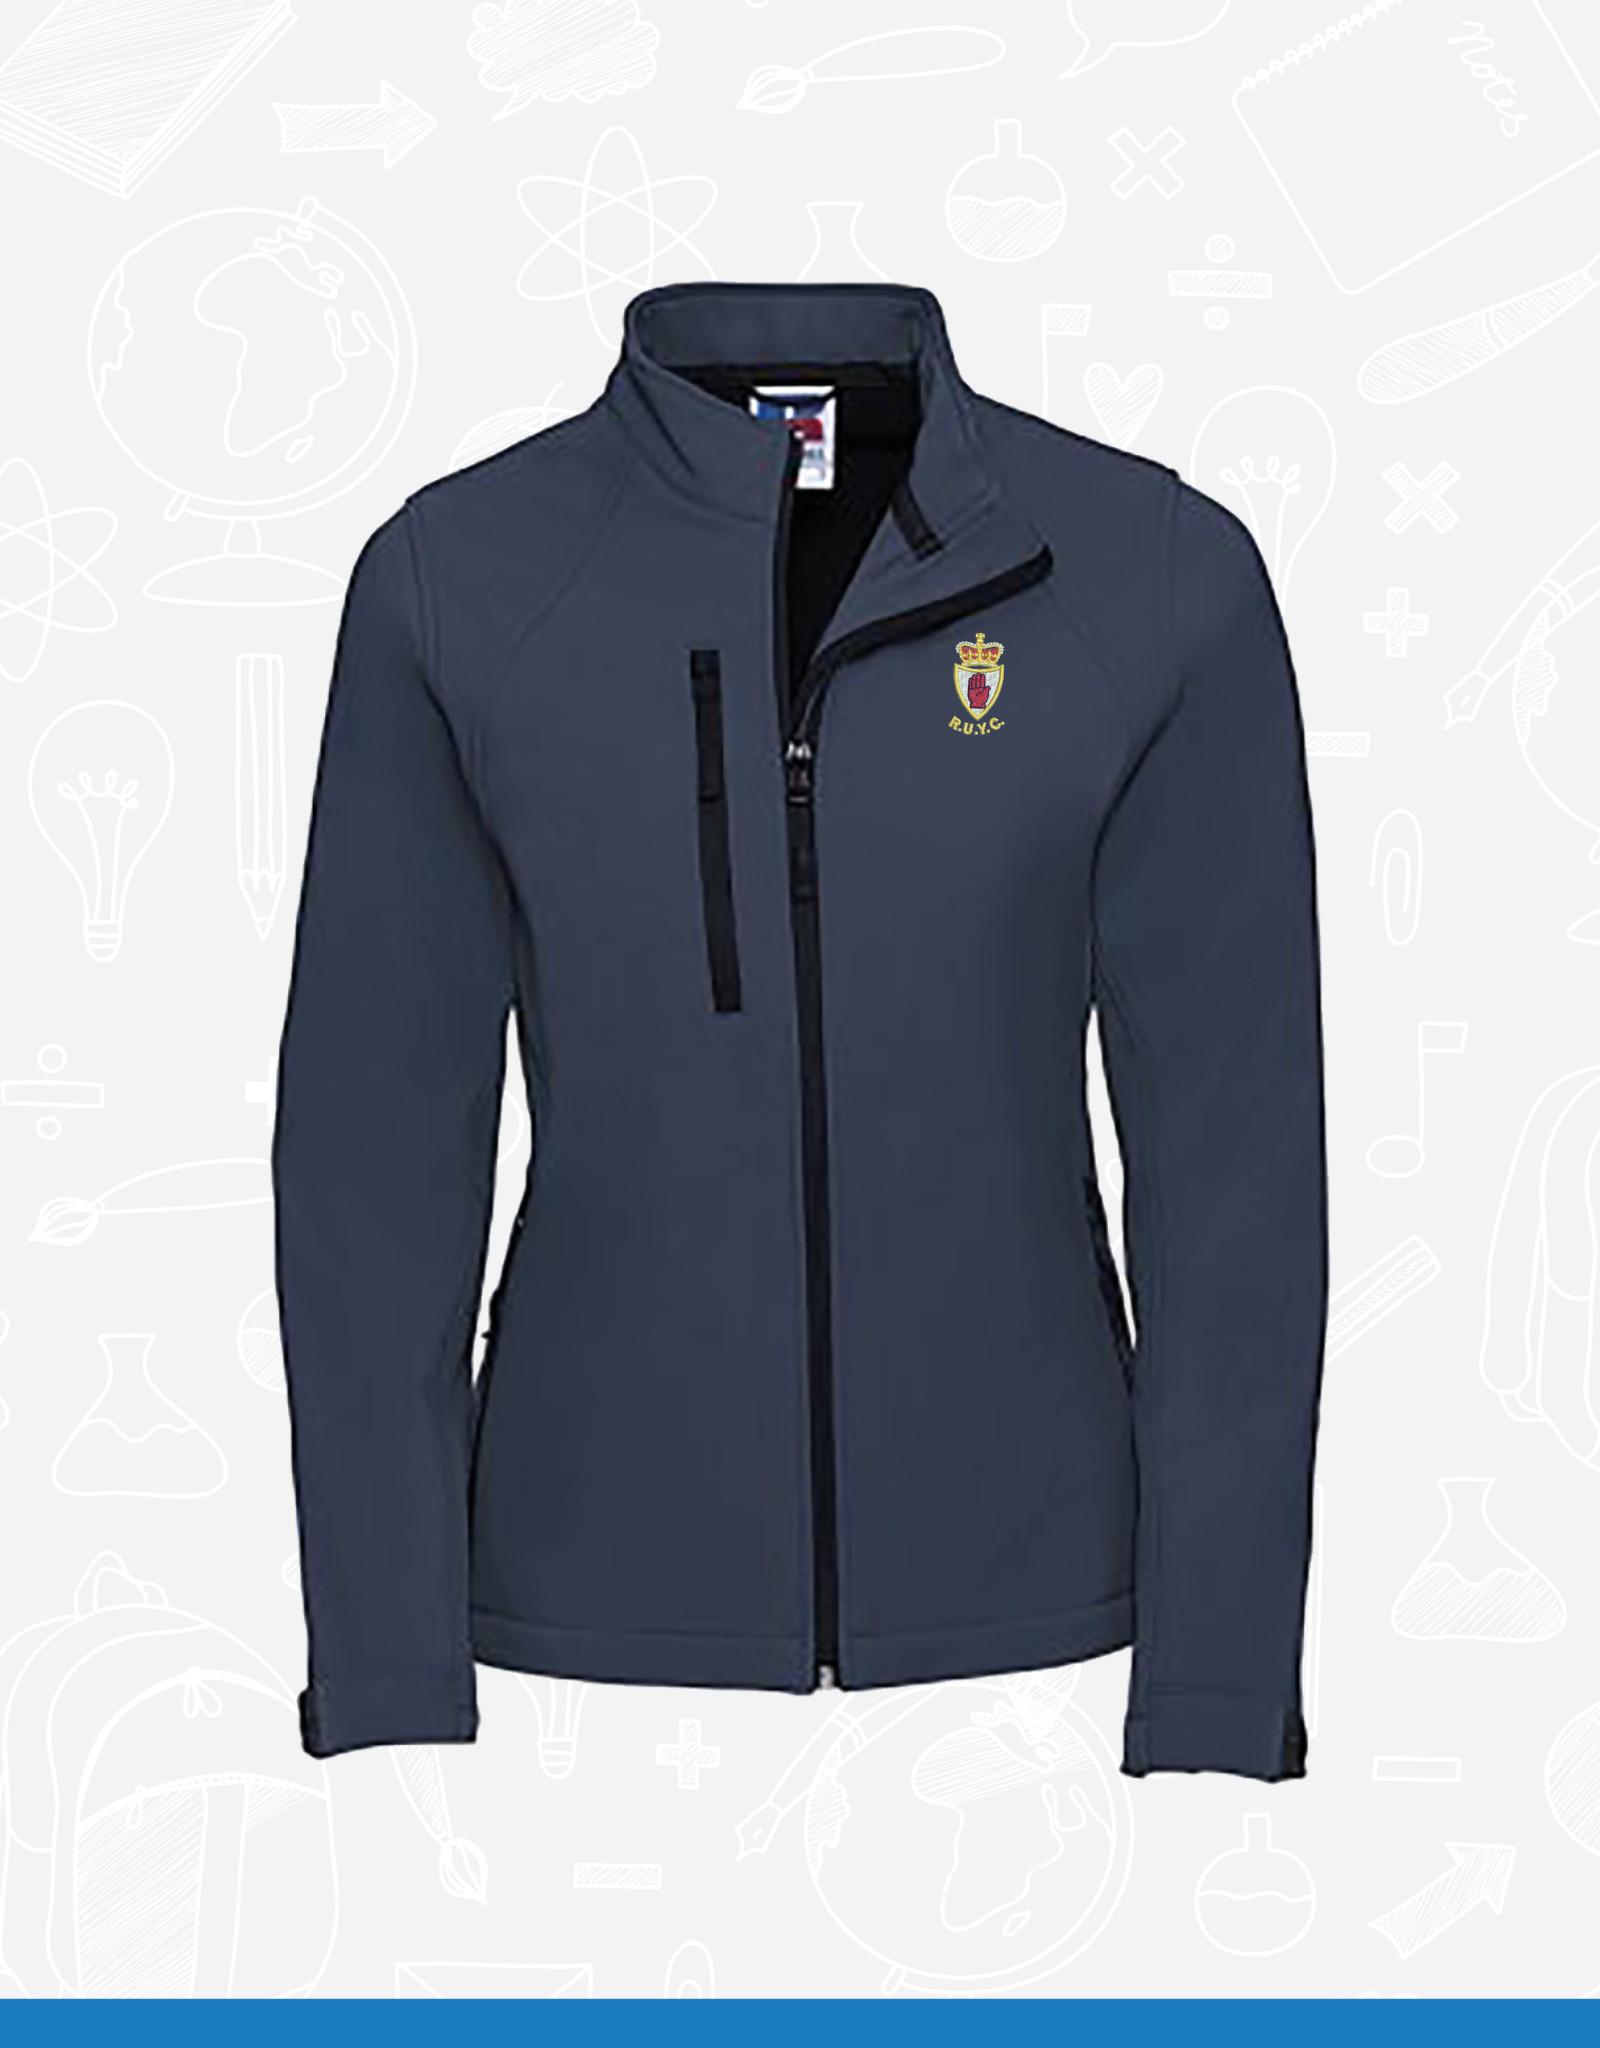 Russell RUYC Ladies Soft Shell Jacket (140F)